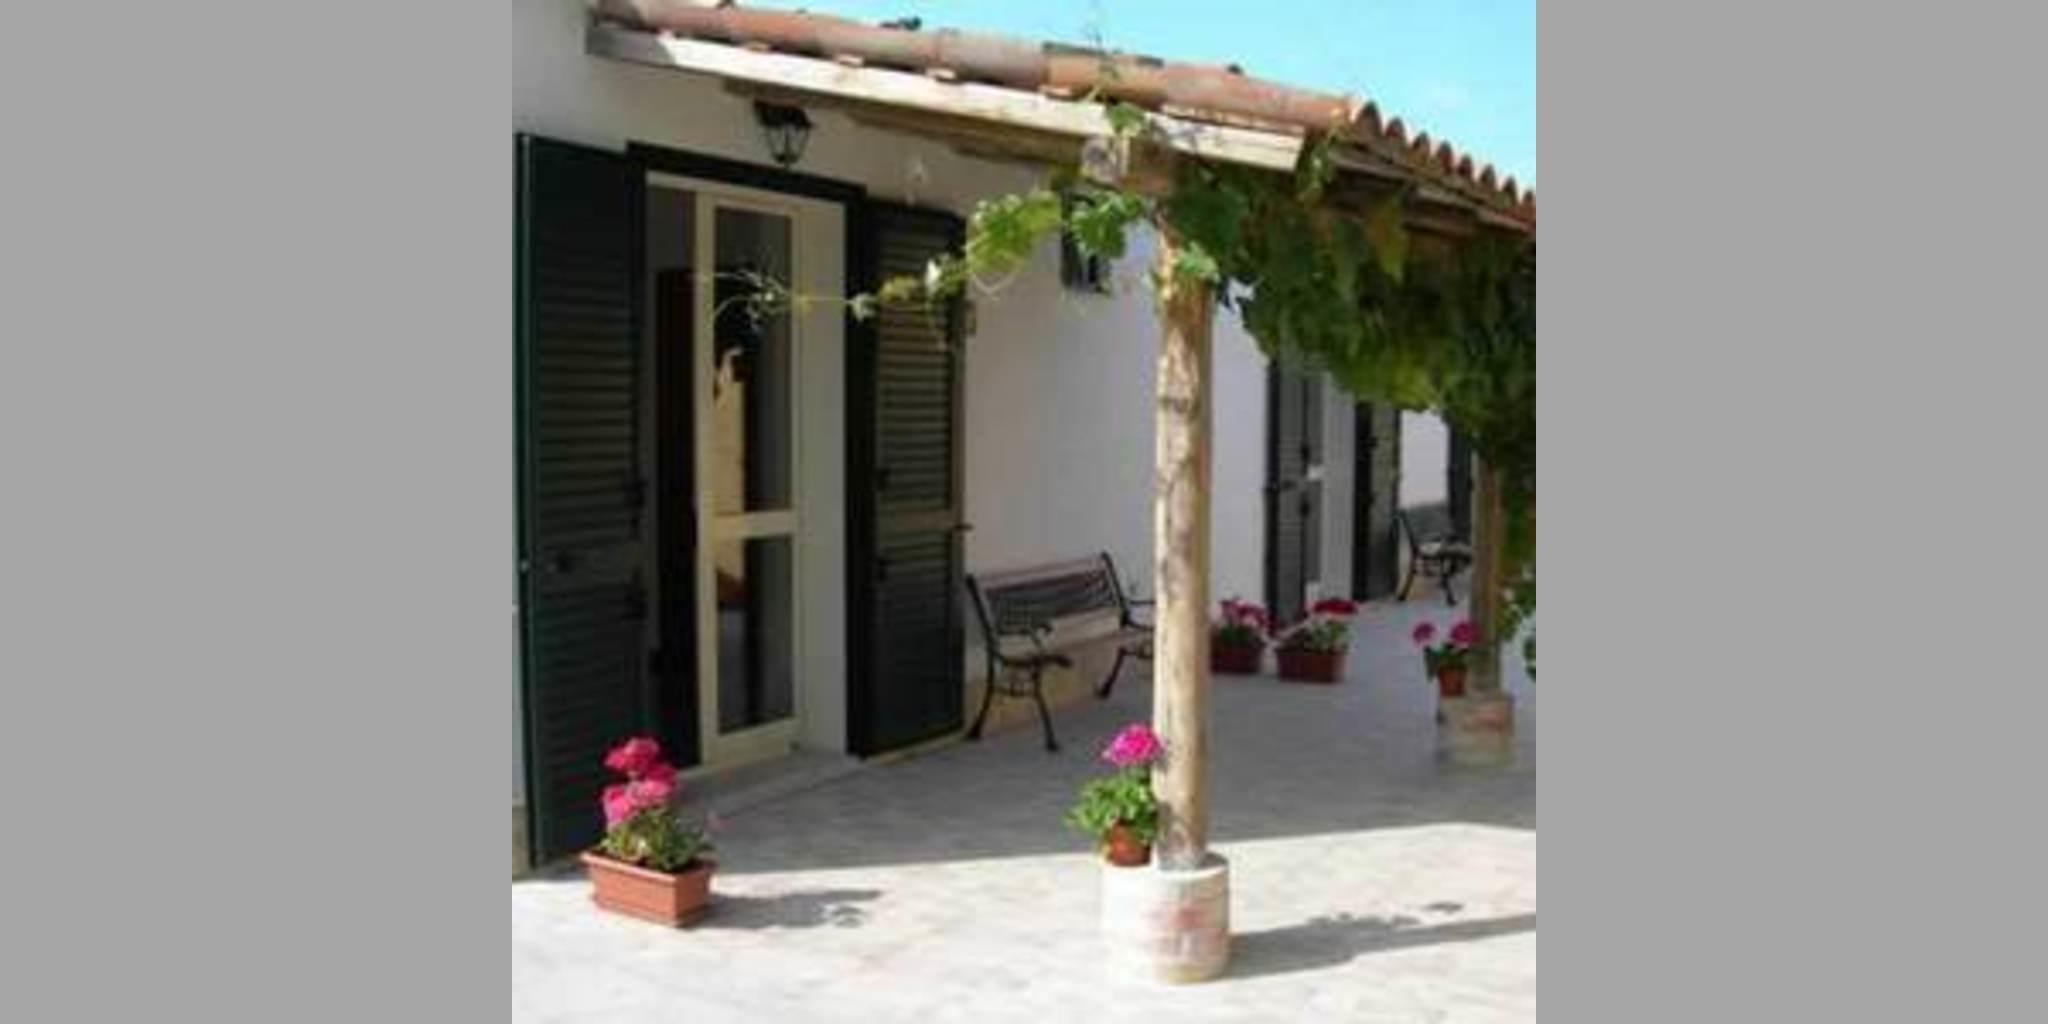 Bed & Breakfast Giardini naxos - Giardini_Naxos